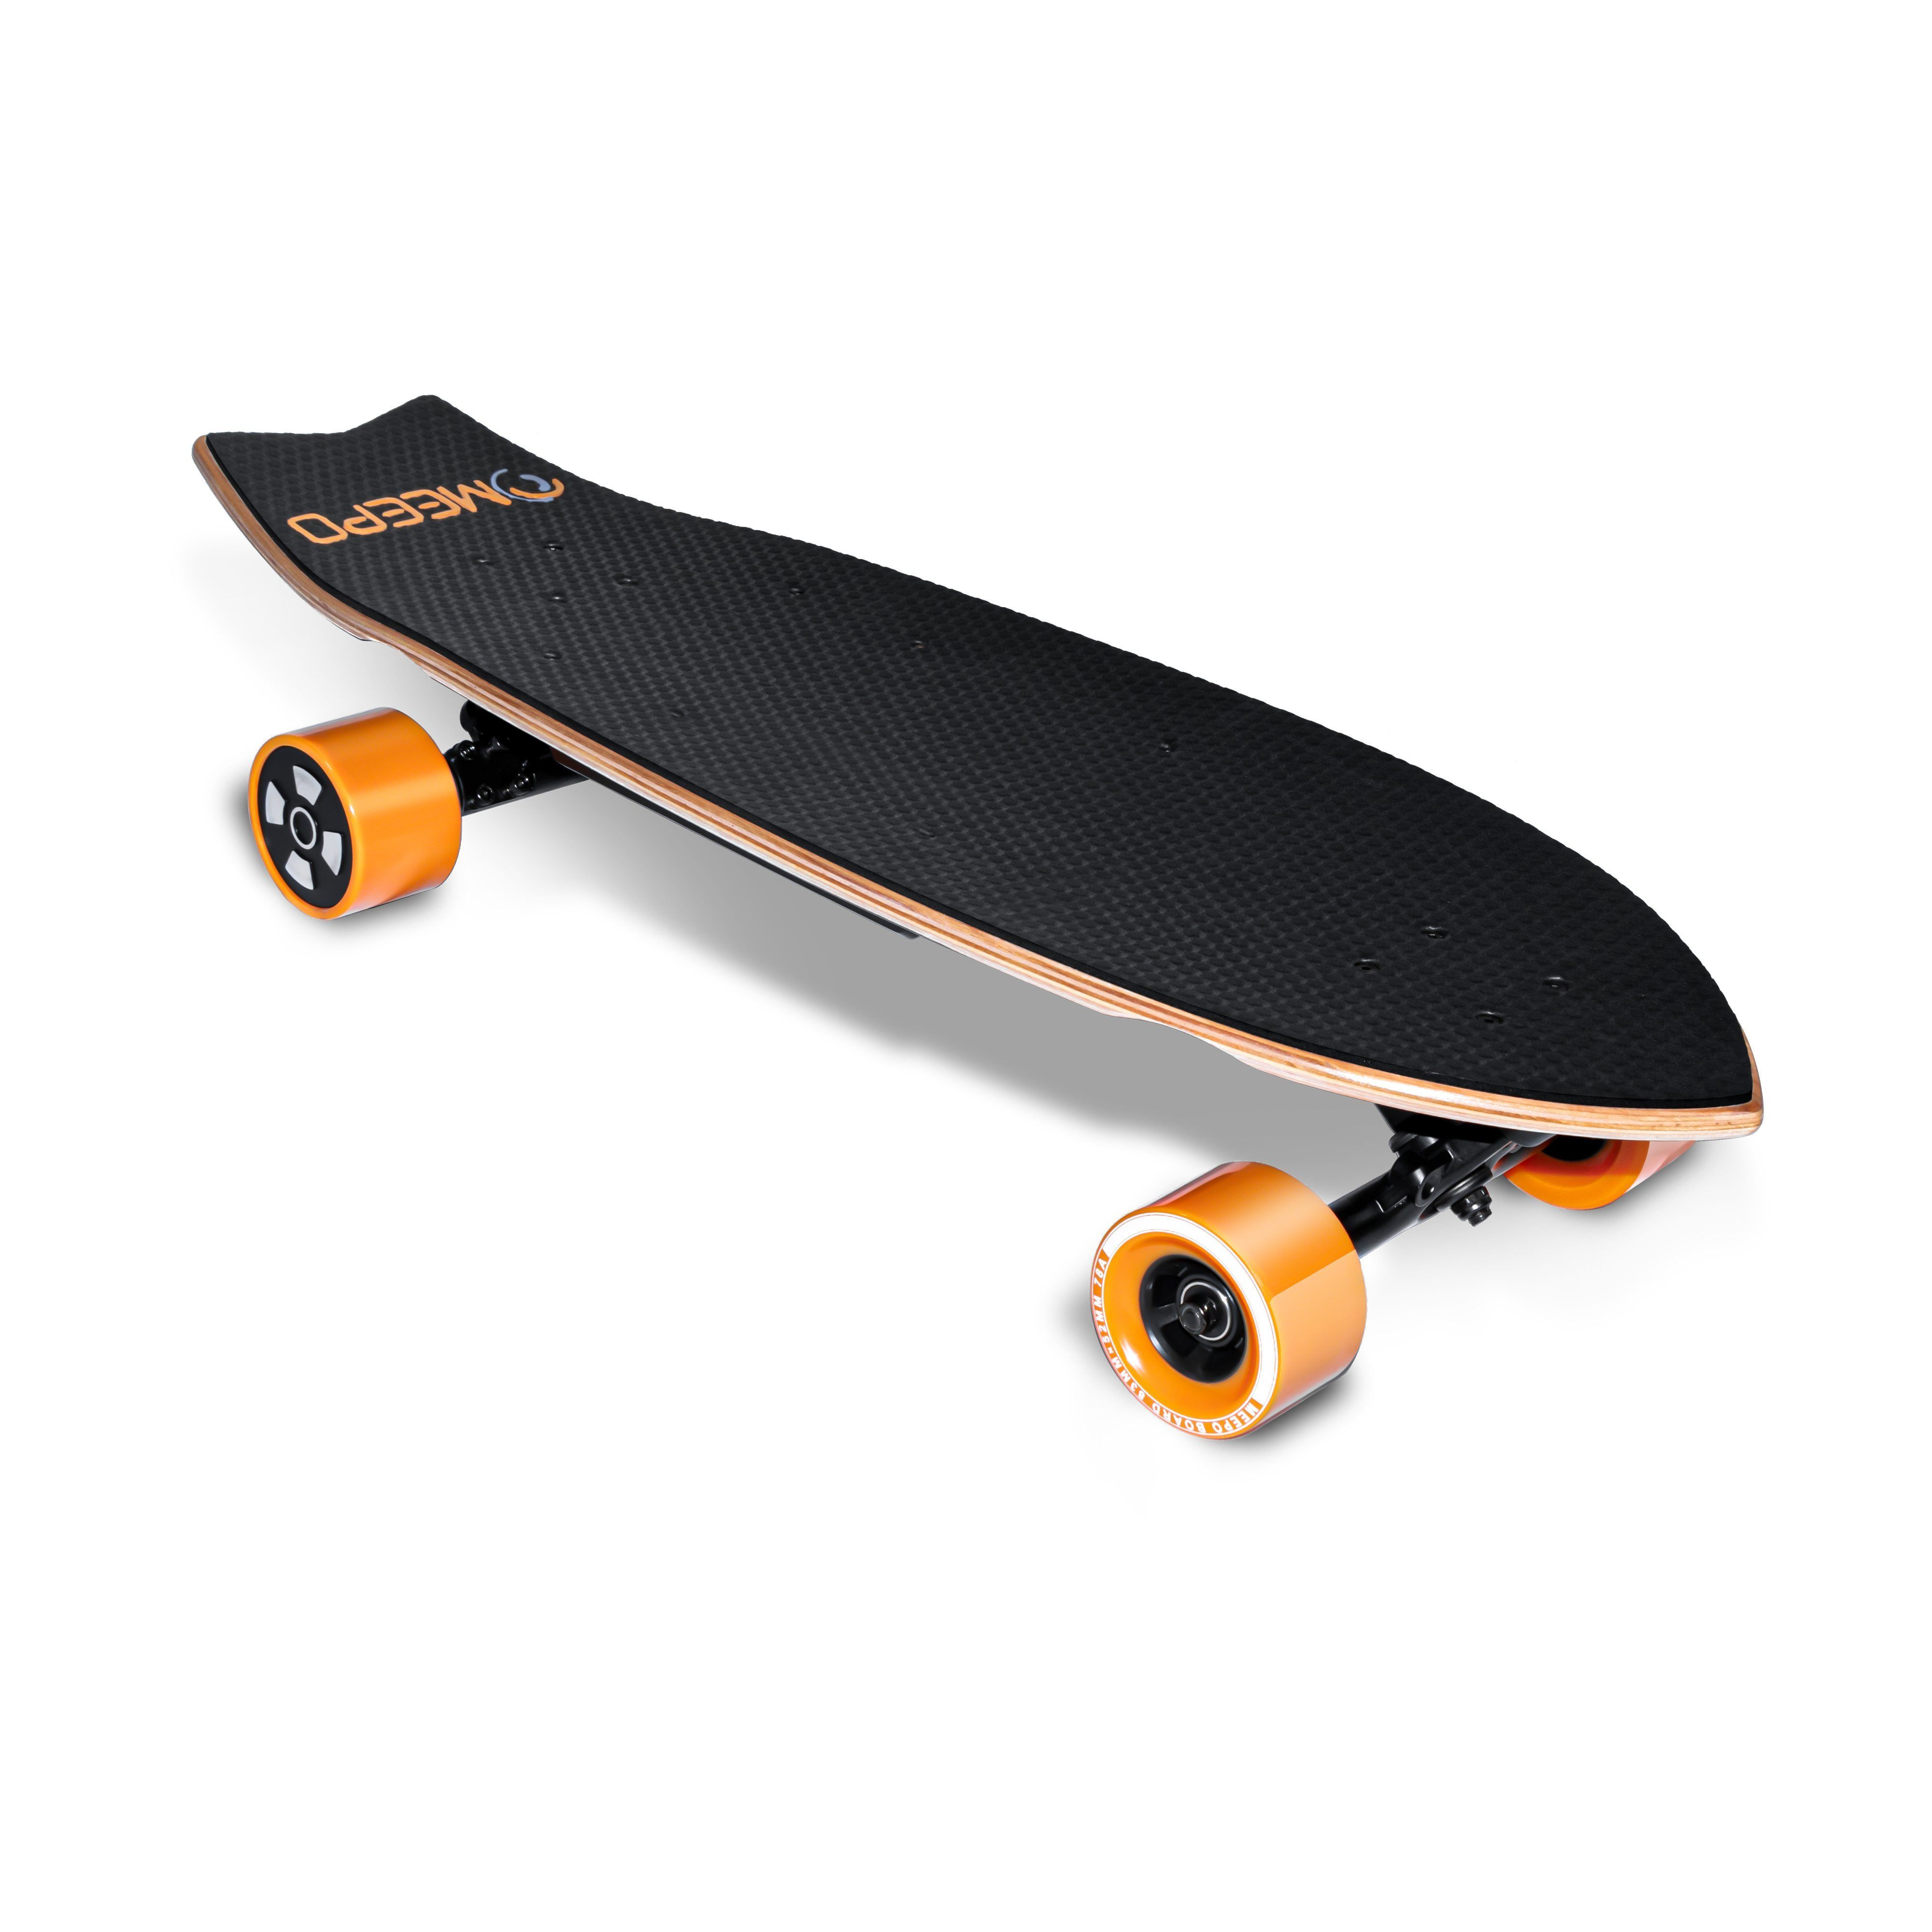 Hoveer Electric Skateboard Meepo Campus 2 Electricskateboard Bestelectricskateboard Skateboarding Electriclongboard